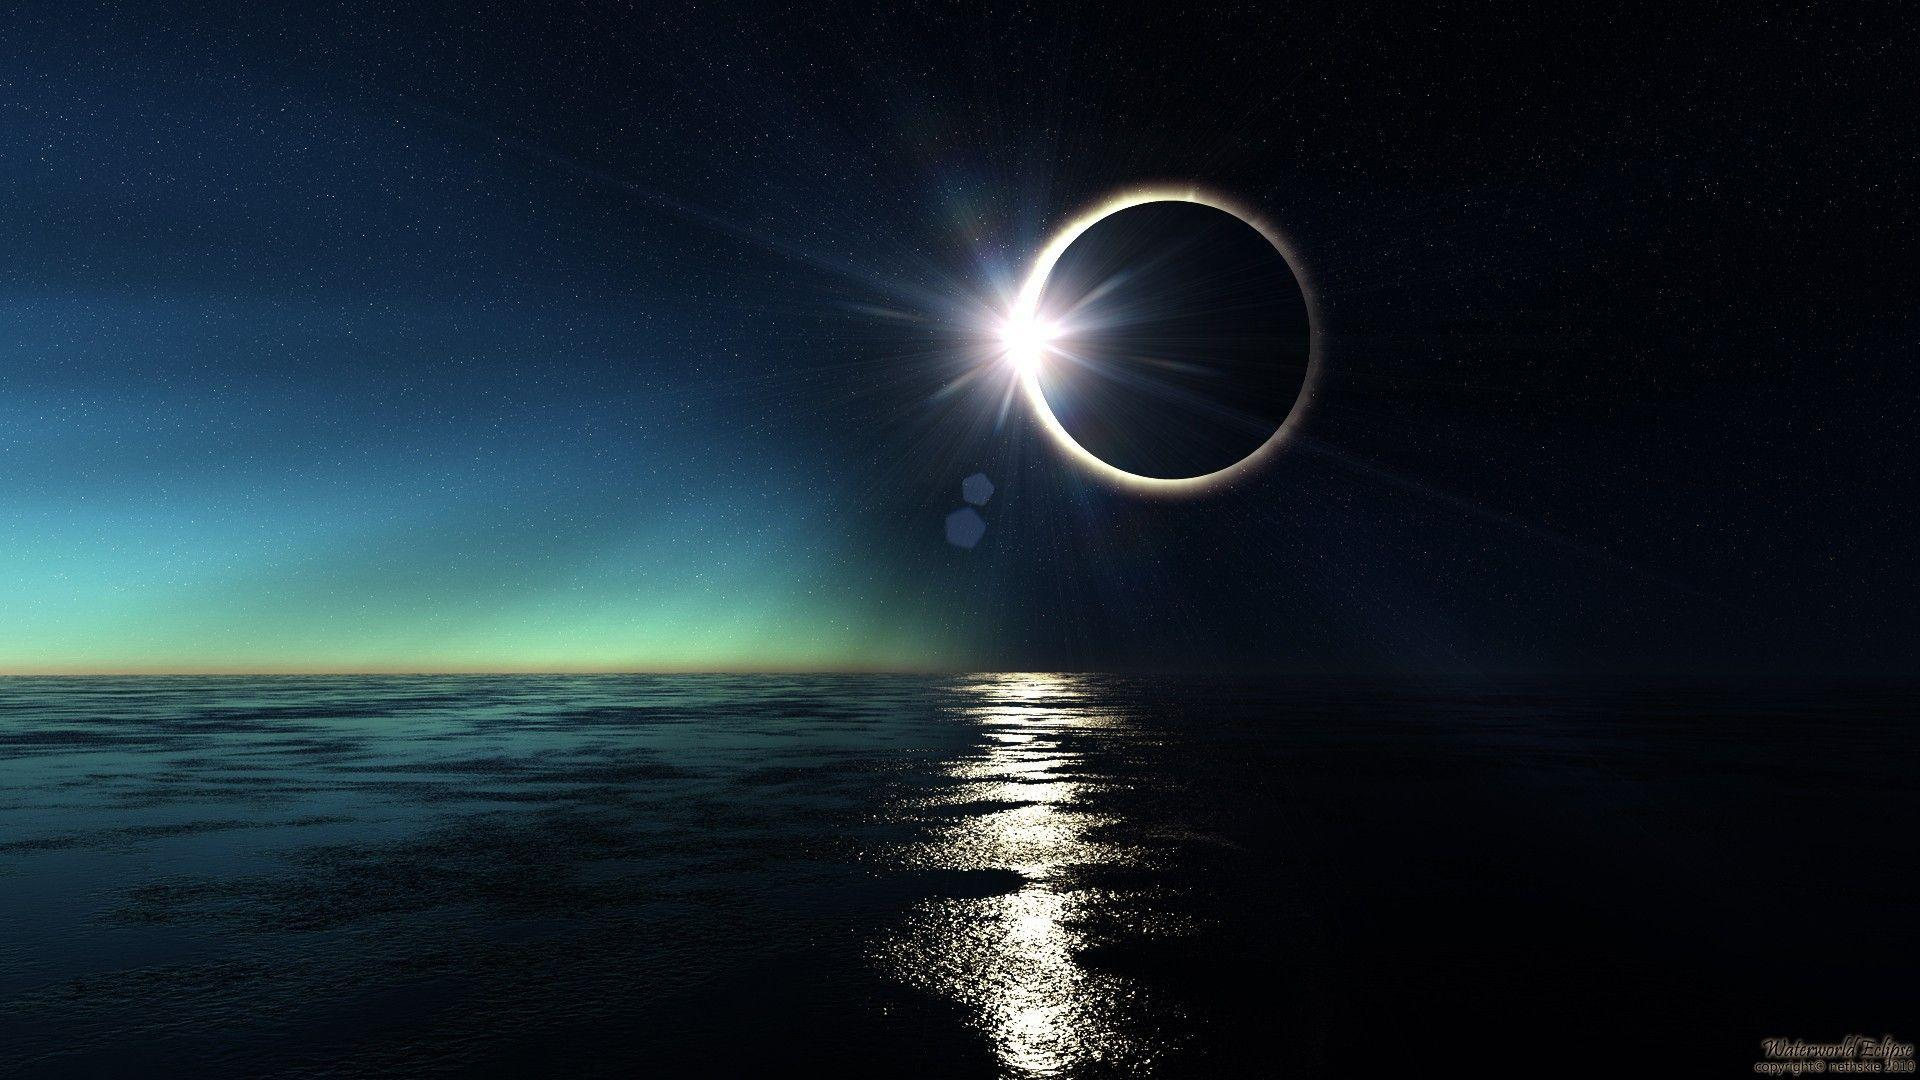 Solar Eclipse Wallpapers - Wallpaper Cave